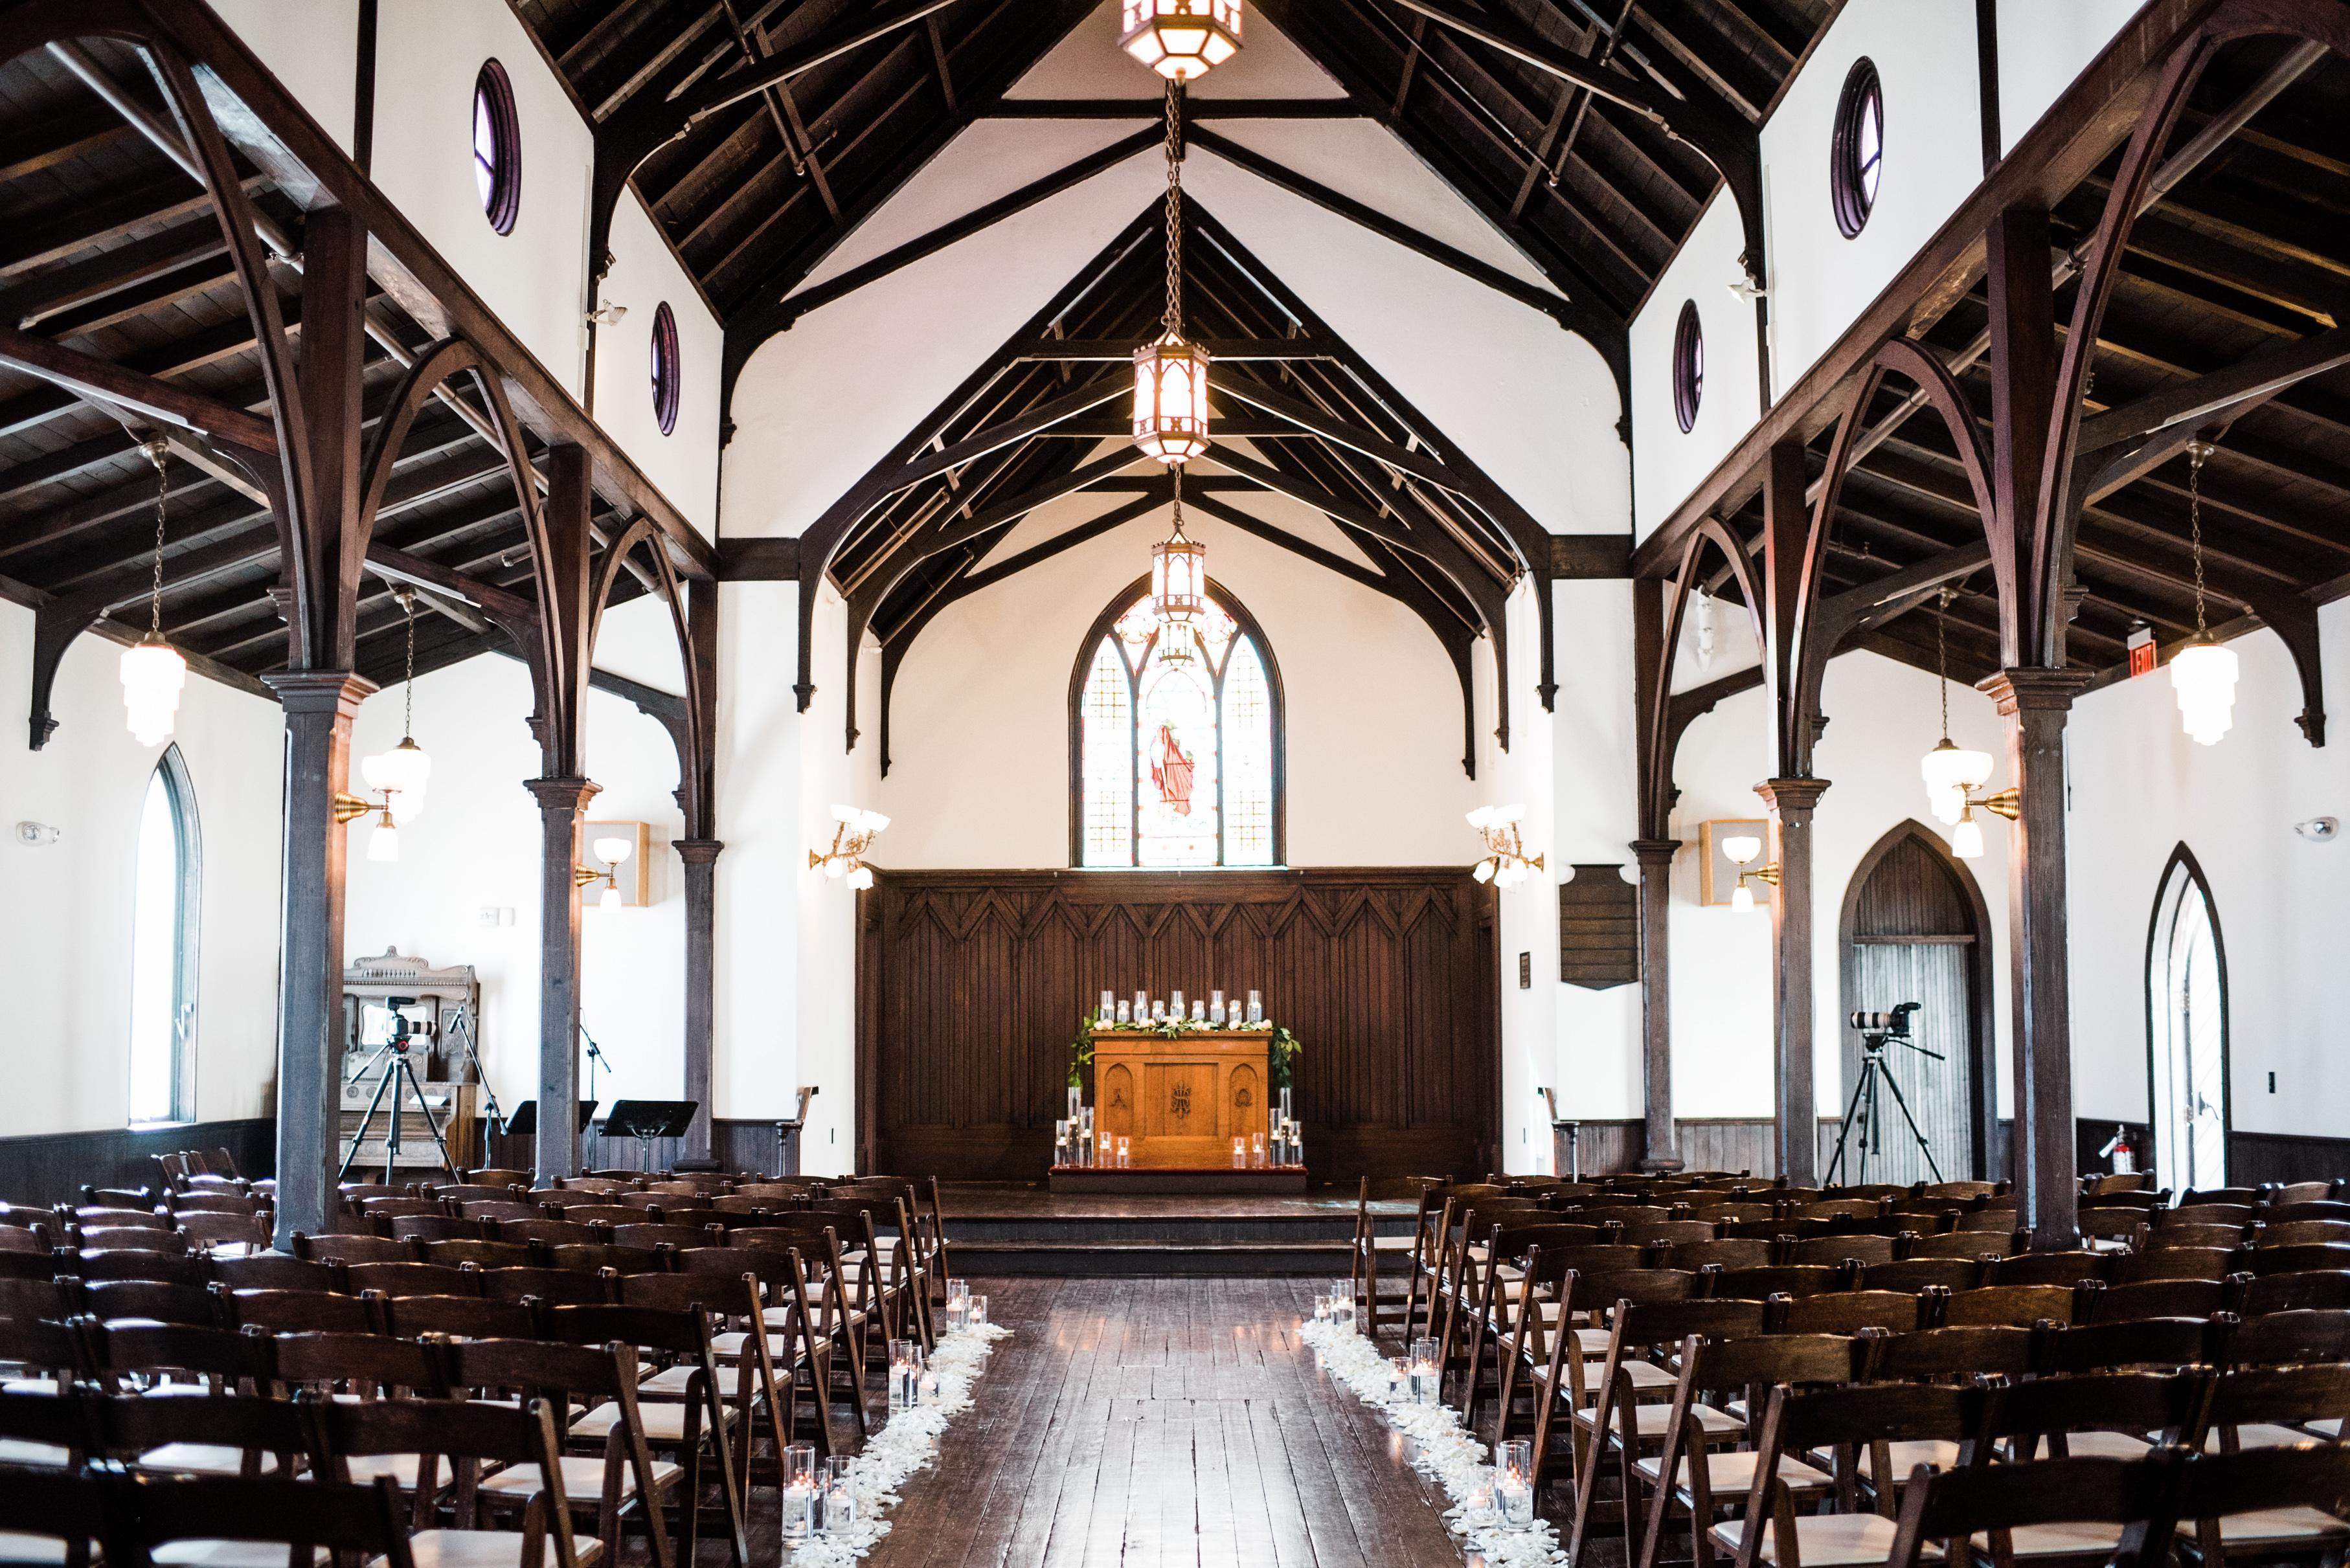 All Saints Chapel Venue Raleigh Get Your Price Estimate